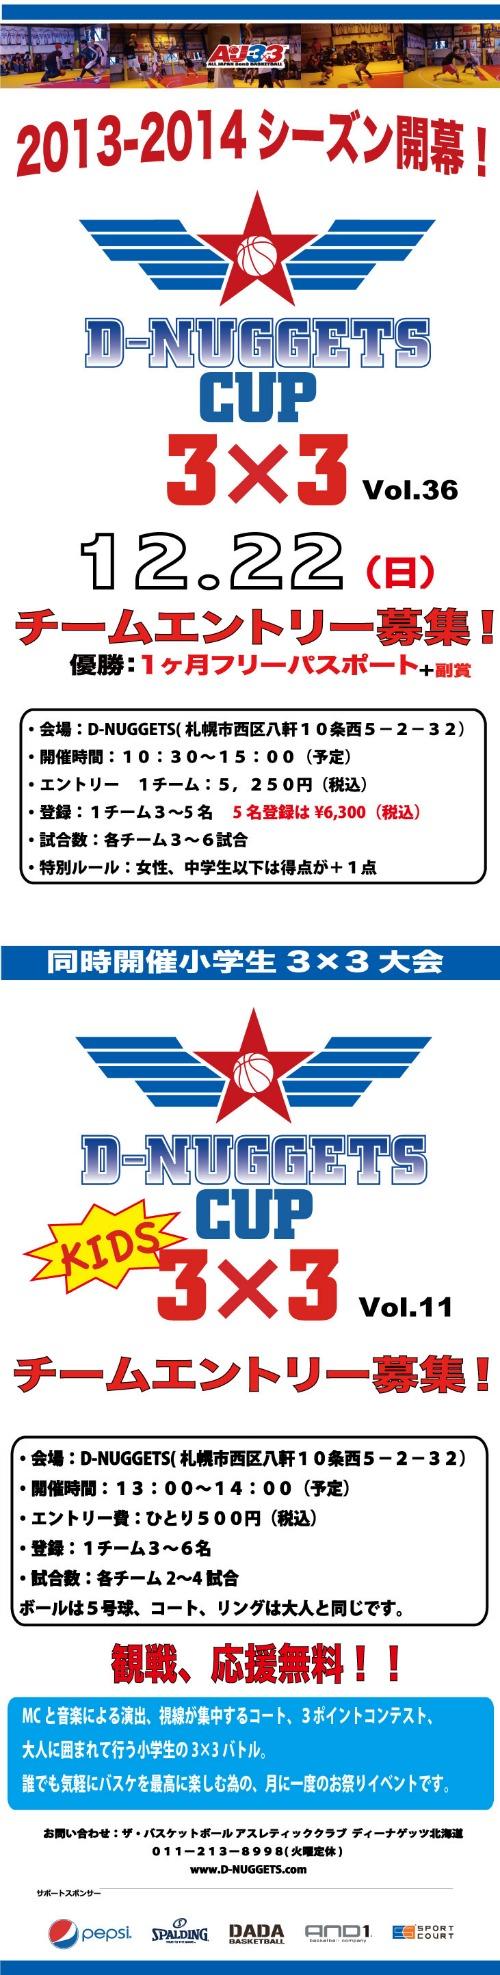 D-NUGGETS-CUP-HOKKAIDO-Vol.36.jpg